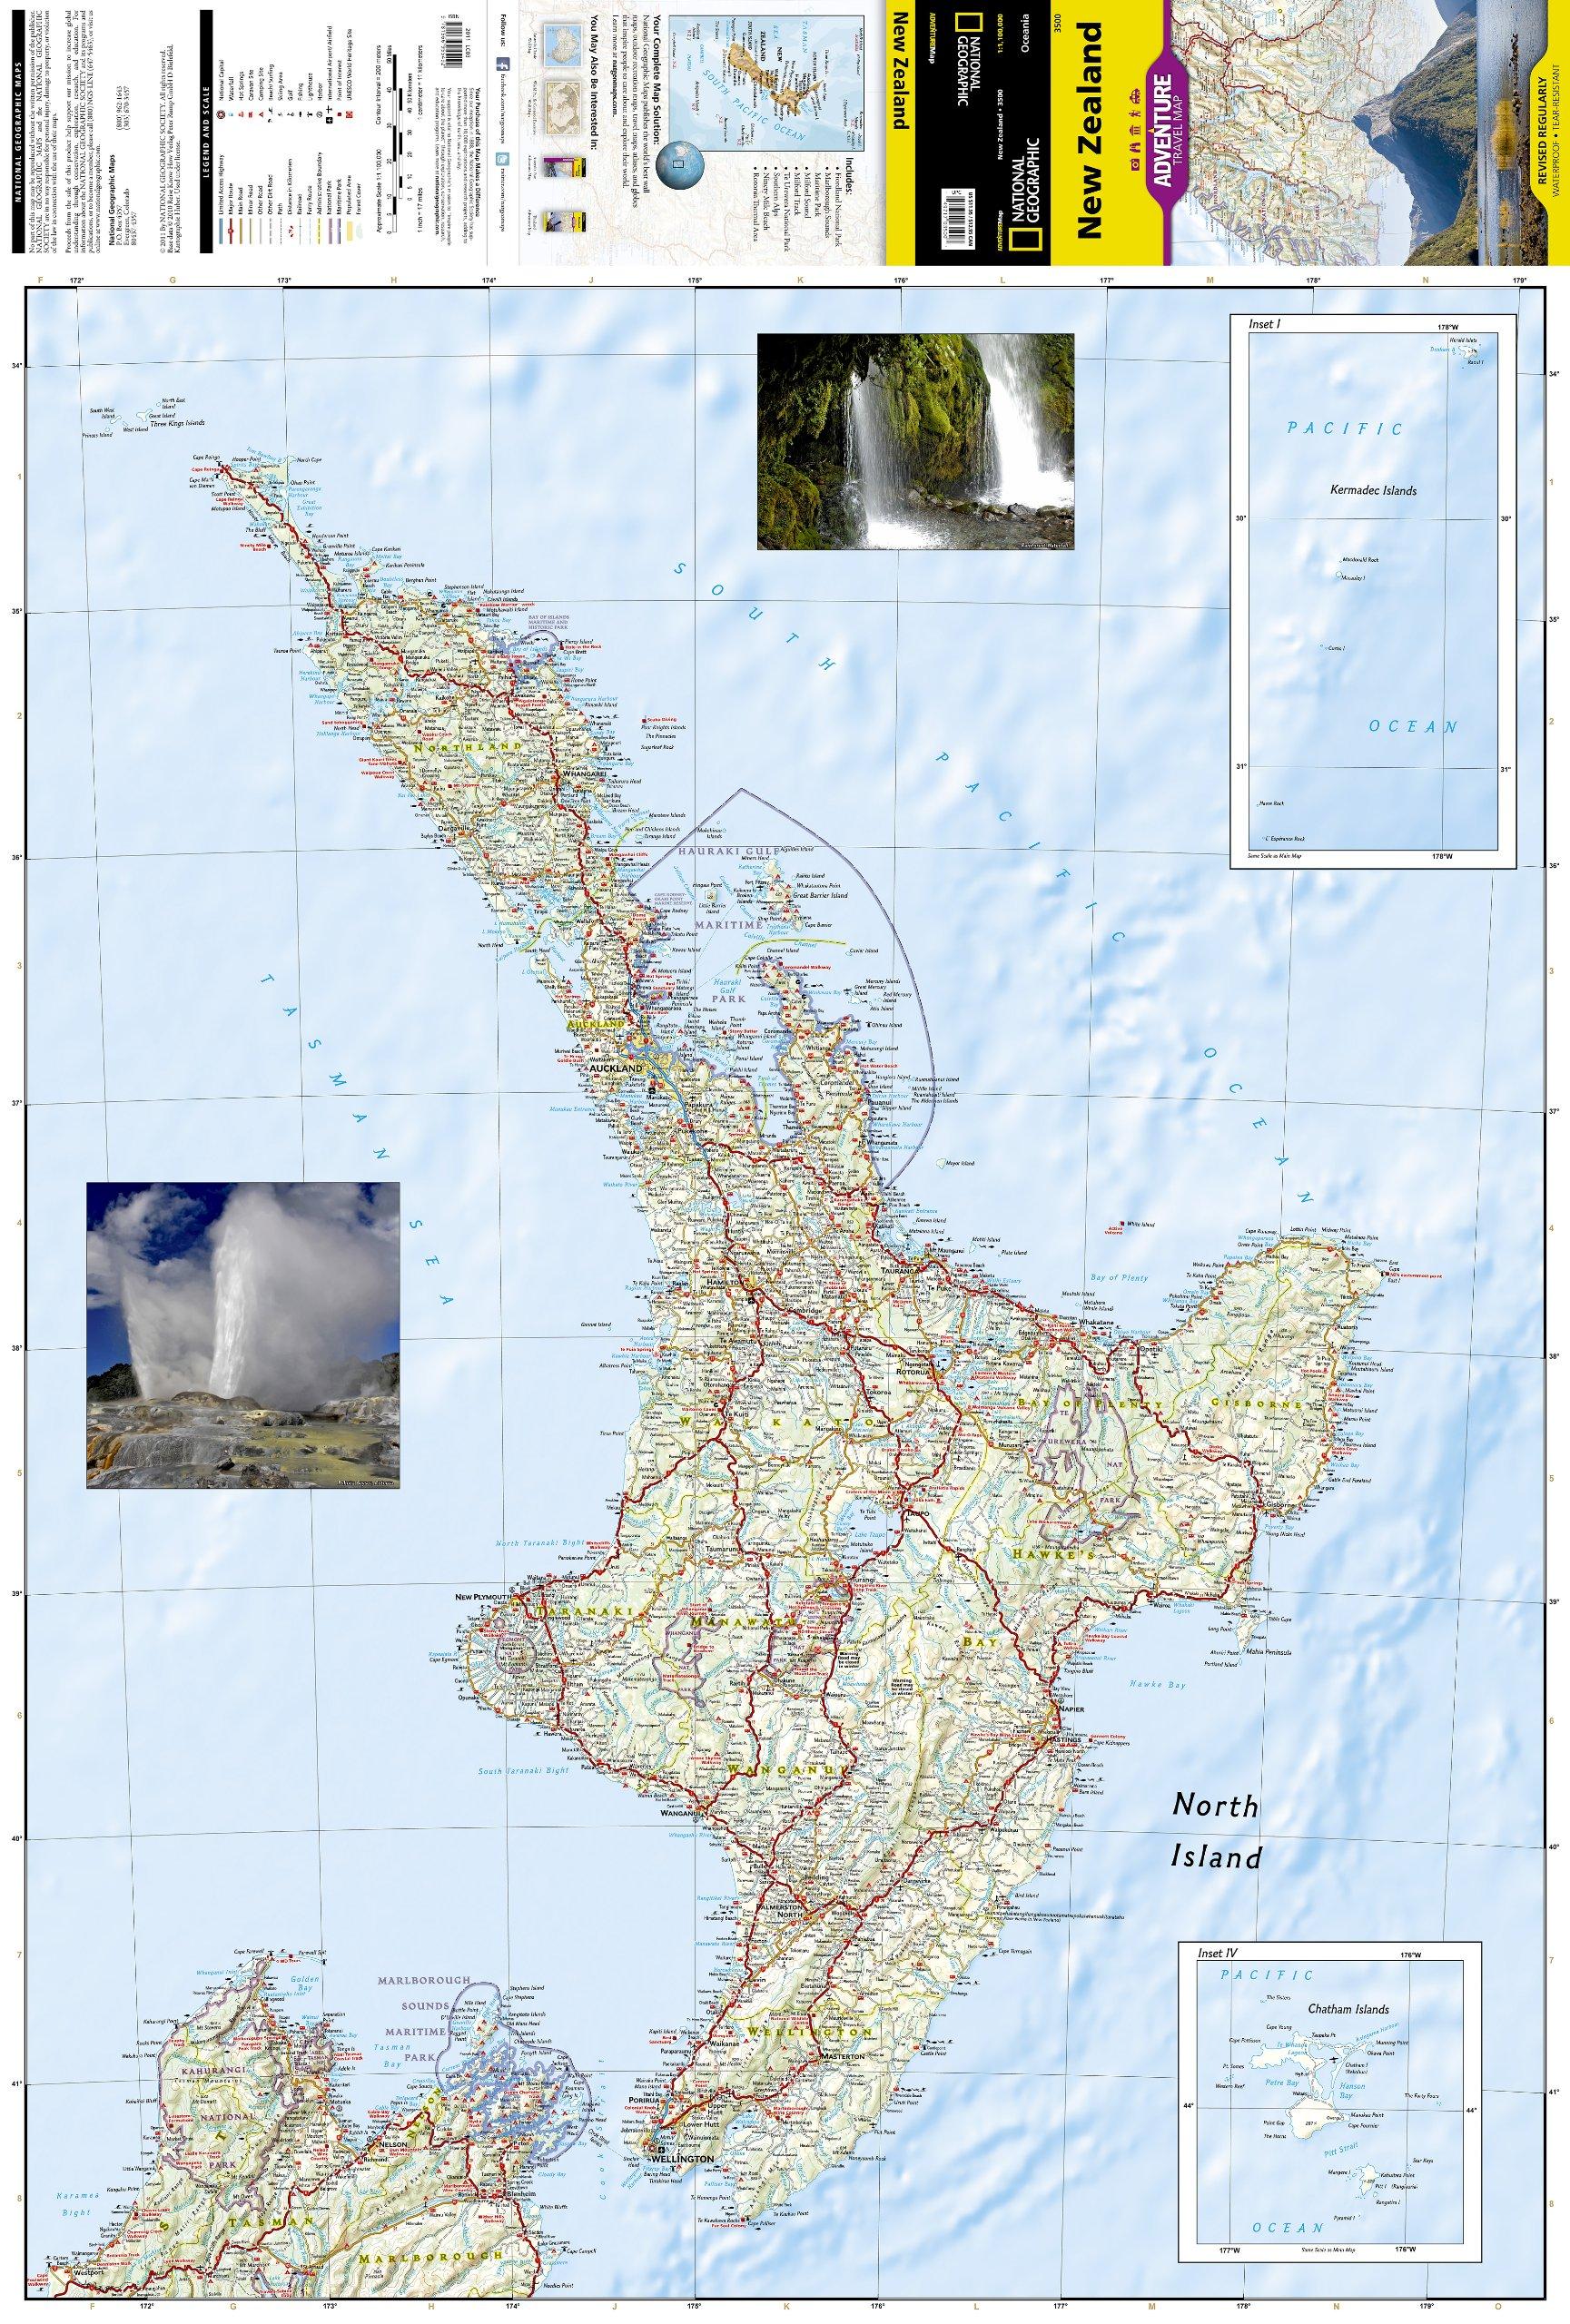 wegenkaart - landkaart 3500 adventure map new zealand